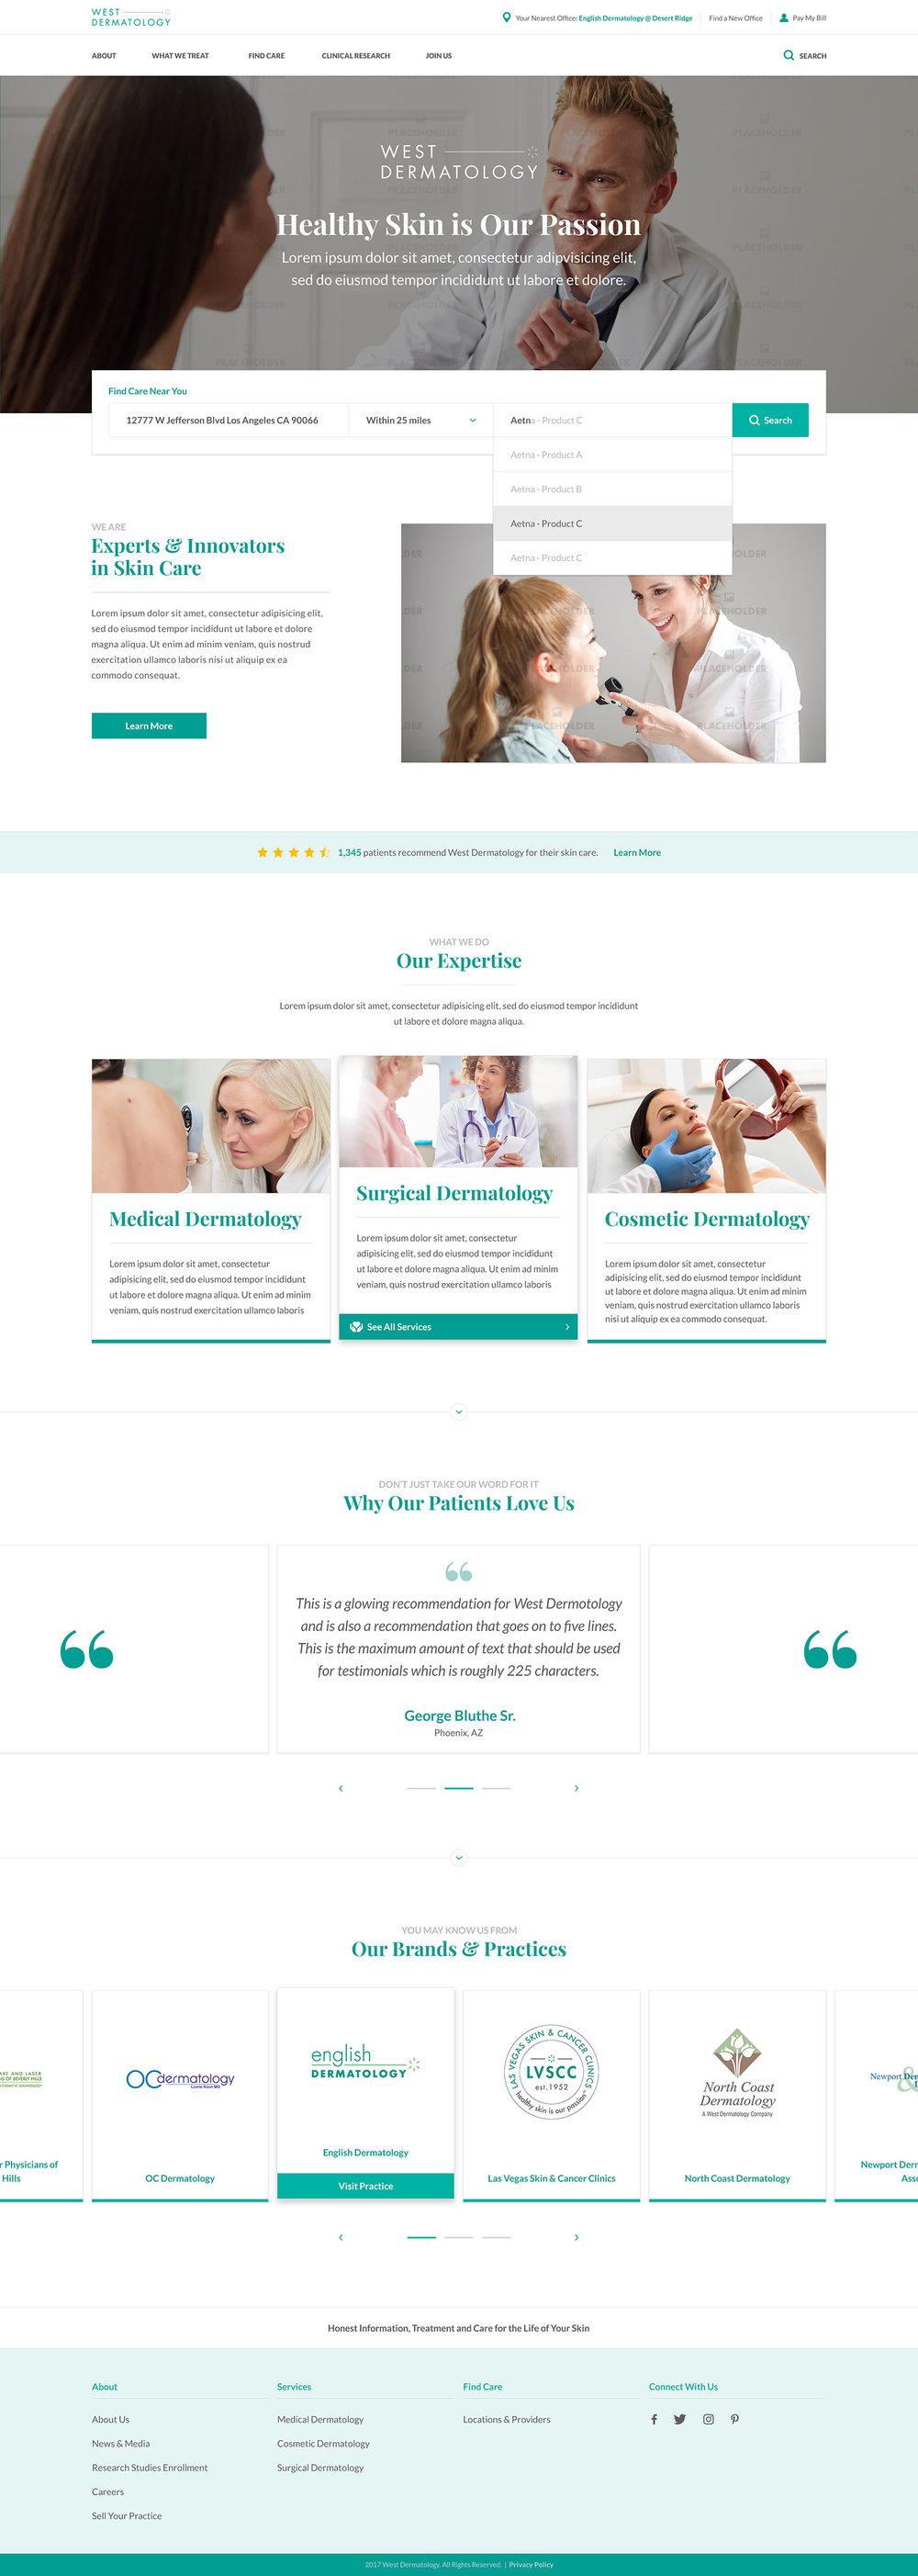 West Dermatology — Geoff Roseborough